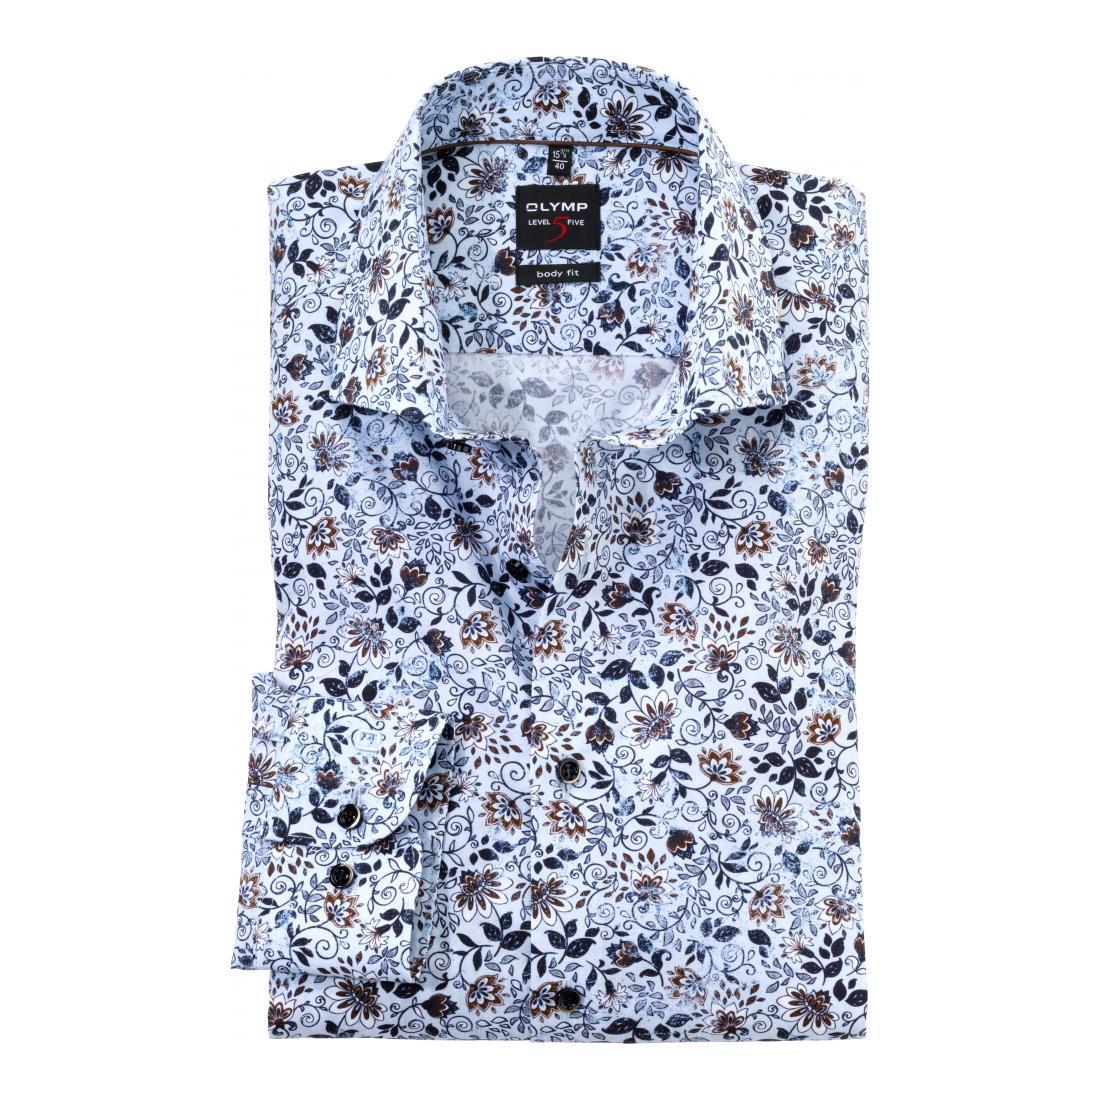 Olymp Business Hemden Herren 2160/74 Hemden